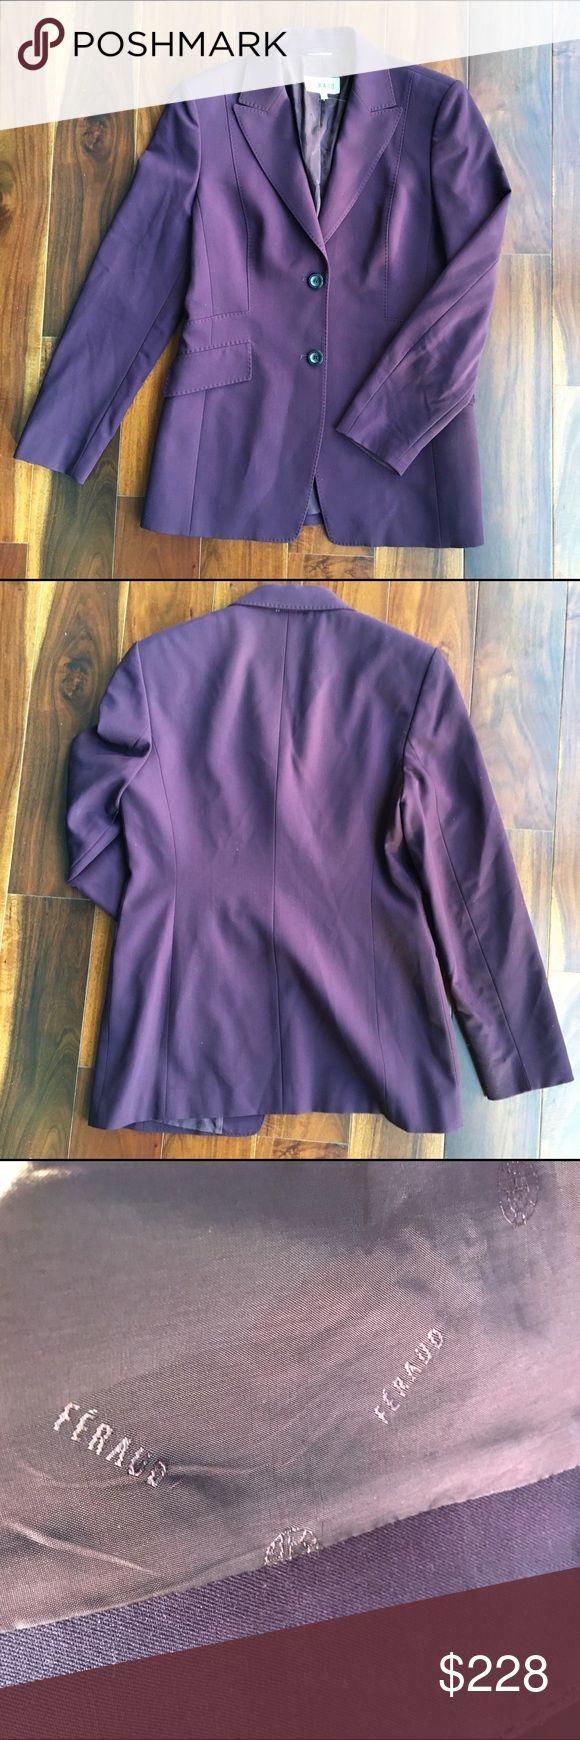 Feraud Paris Wool Purple Blazer Gorgeous Parisian craftsmanship in the beautiful jacket.   Fully lined in branded fabric.  Size FR 40, US 8. Feraud Paris Jackets & Coats Blazers